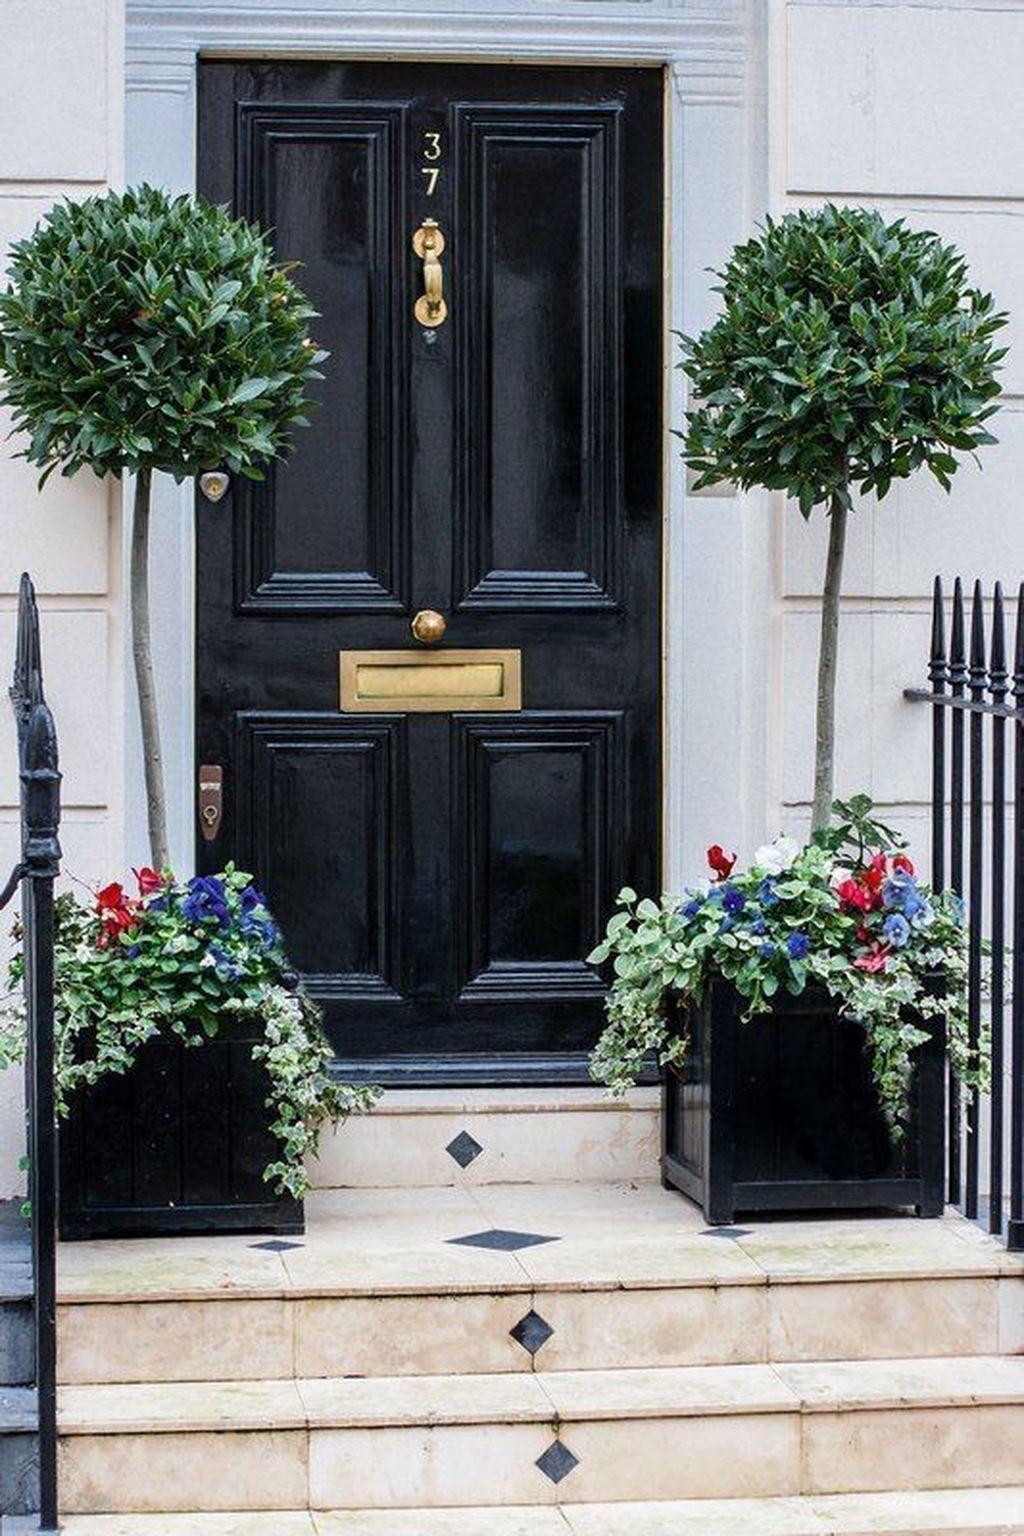 Inspiring Spring Planters Design Ideas For Front Door 28